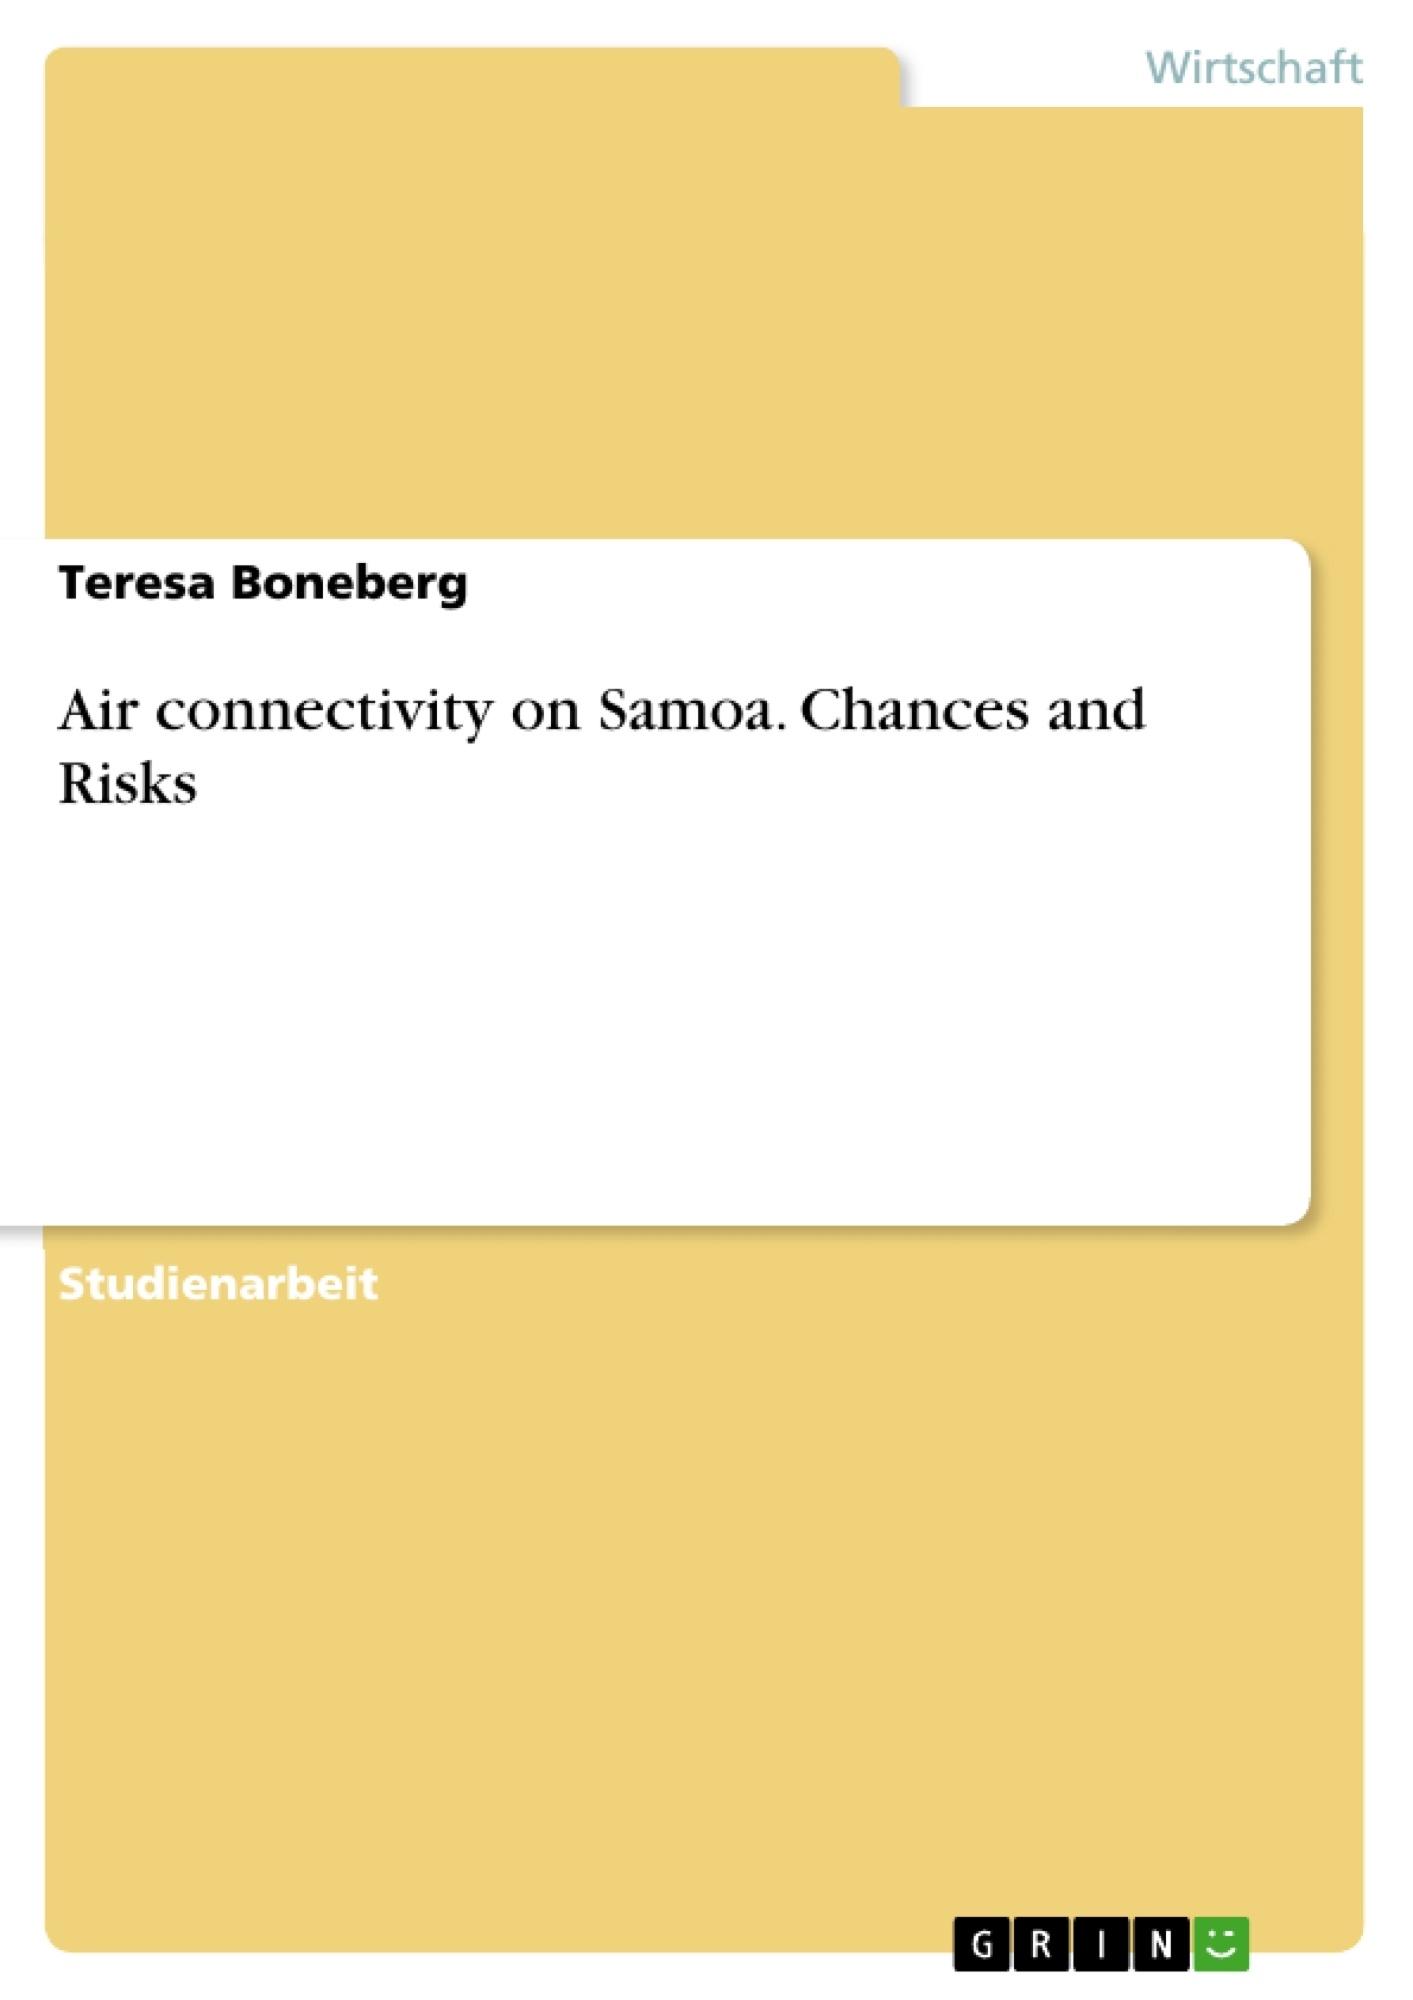 Titel: Air connectivity on Samoa. Chances and Risks